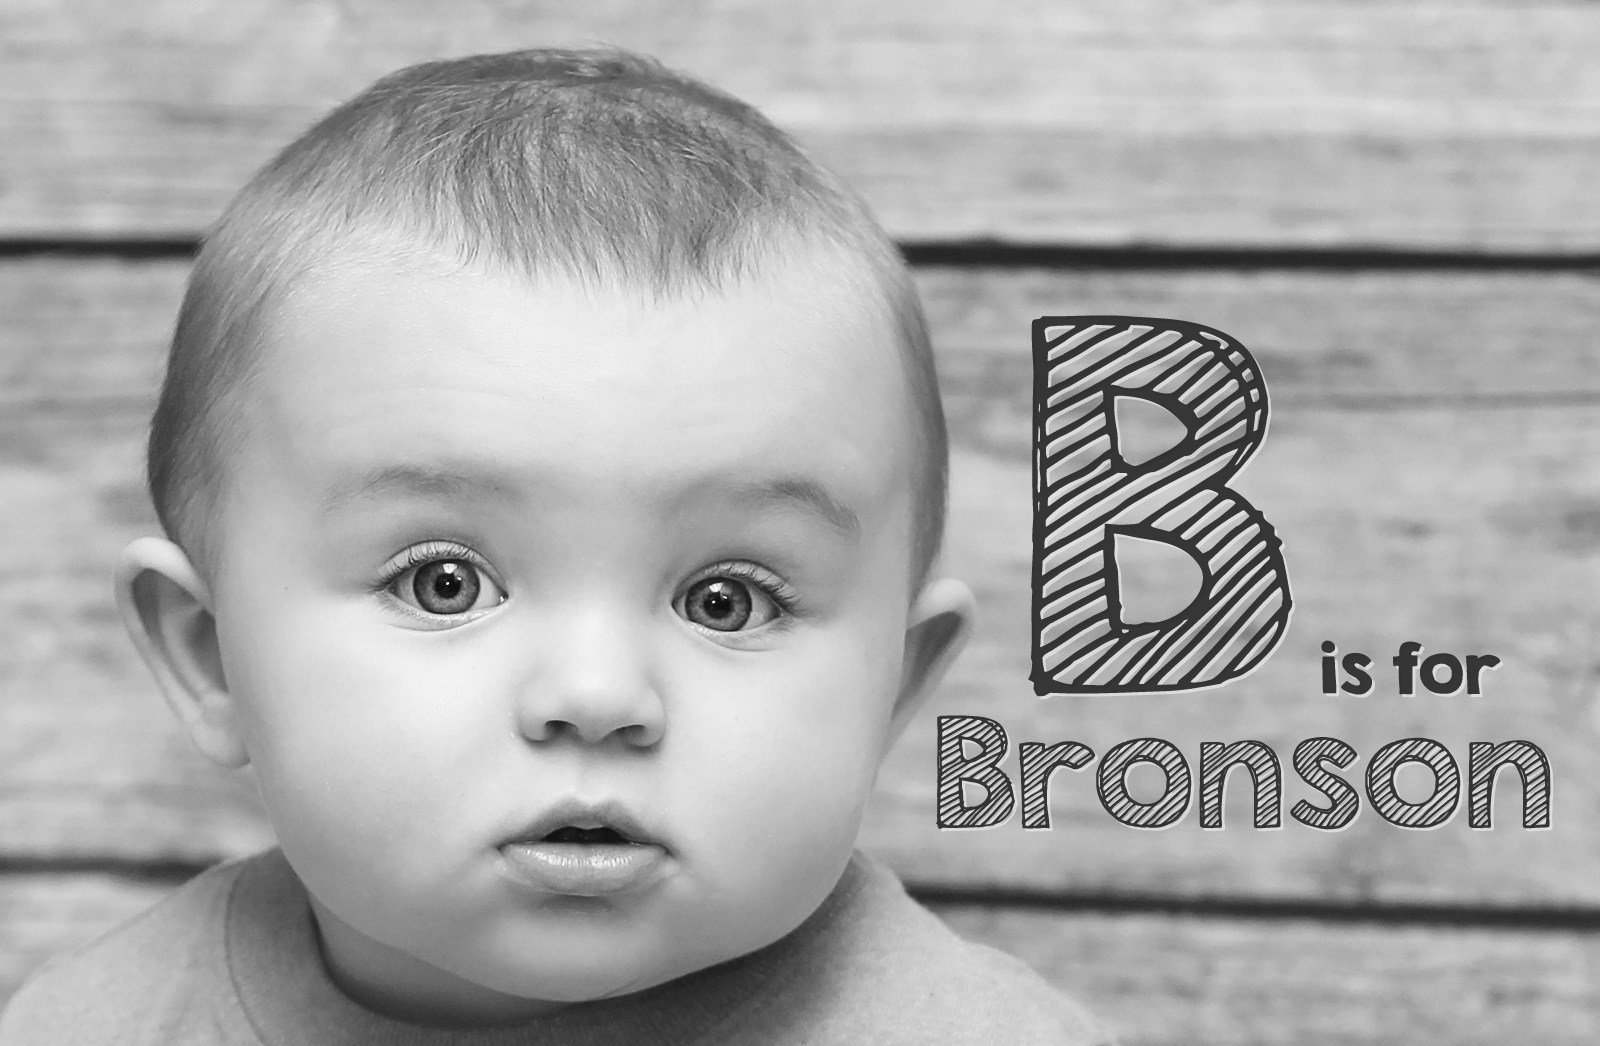 baby Bronson7m3 c o p y.jpg